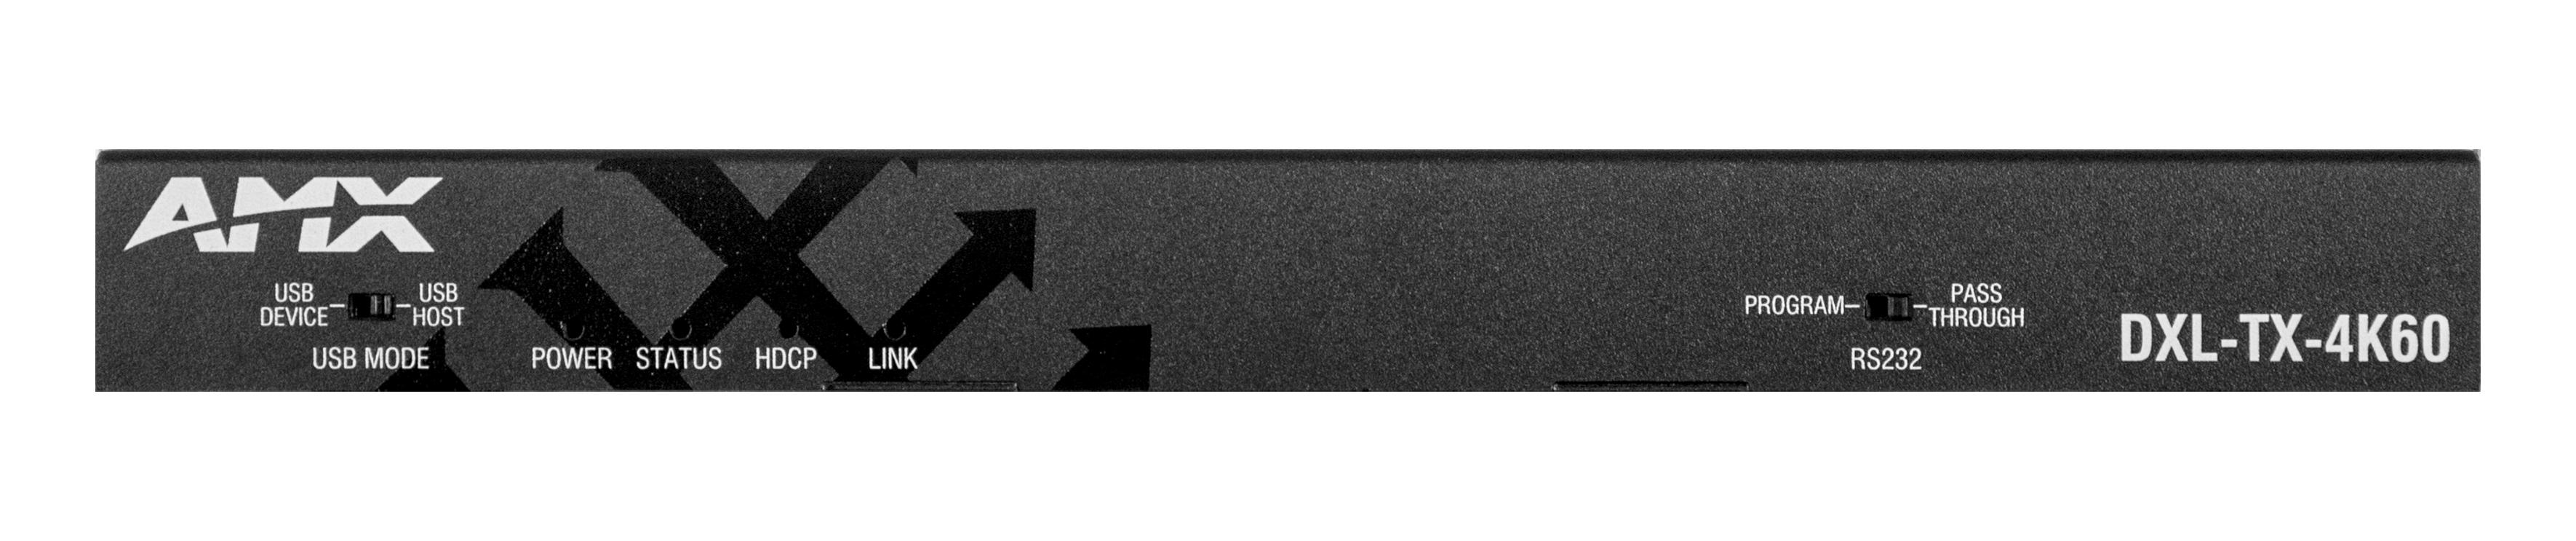 DXL-TX-4K60 | AMX Audio Video Control Systems